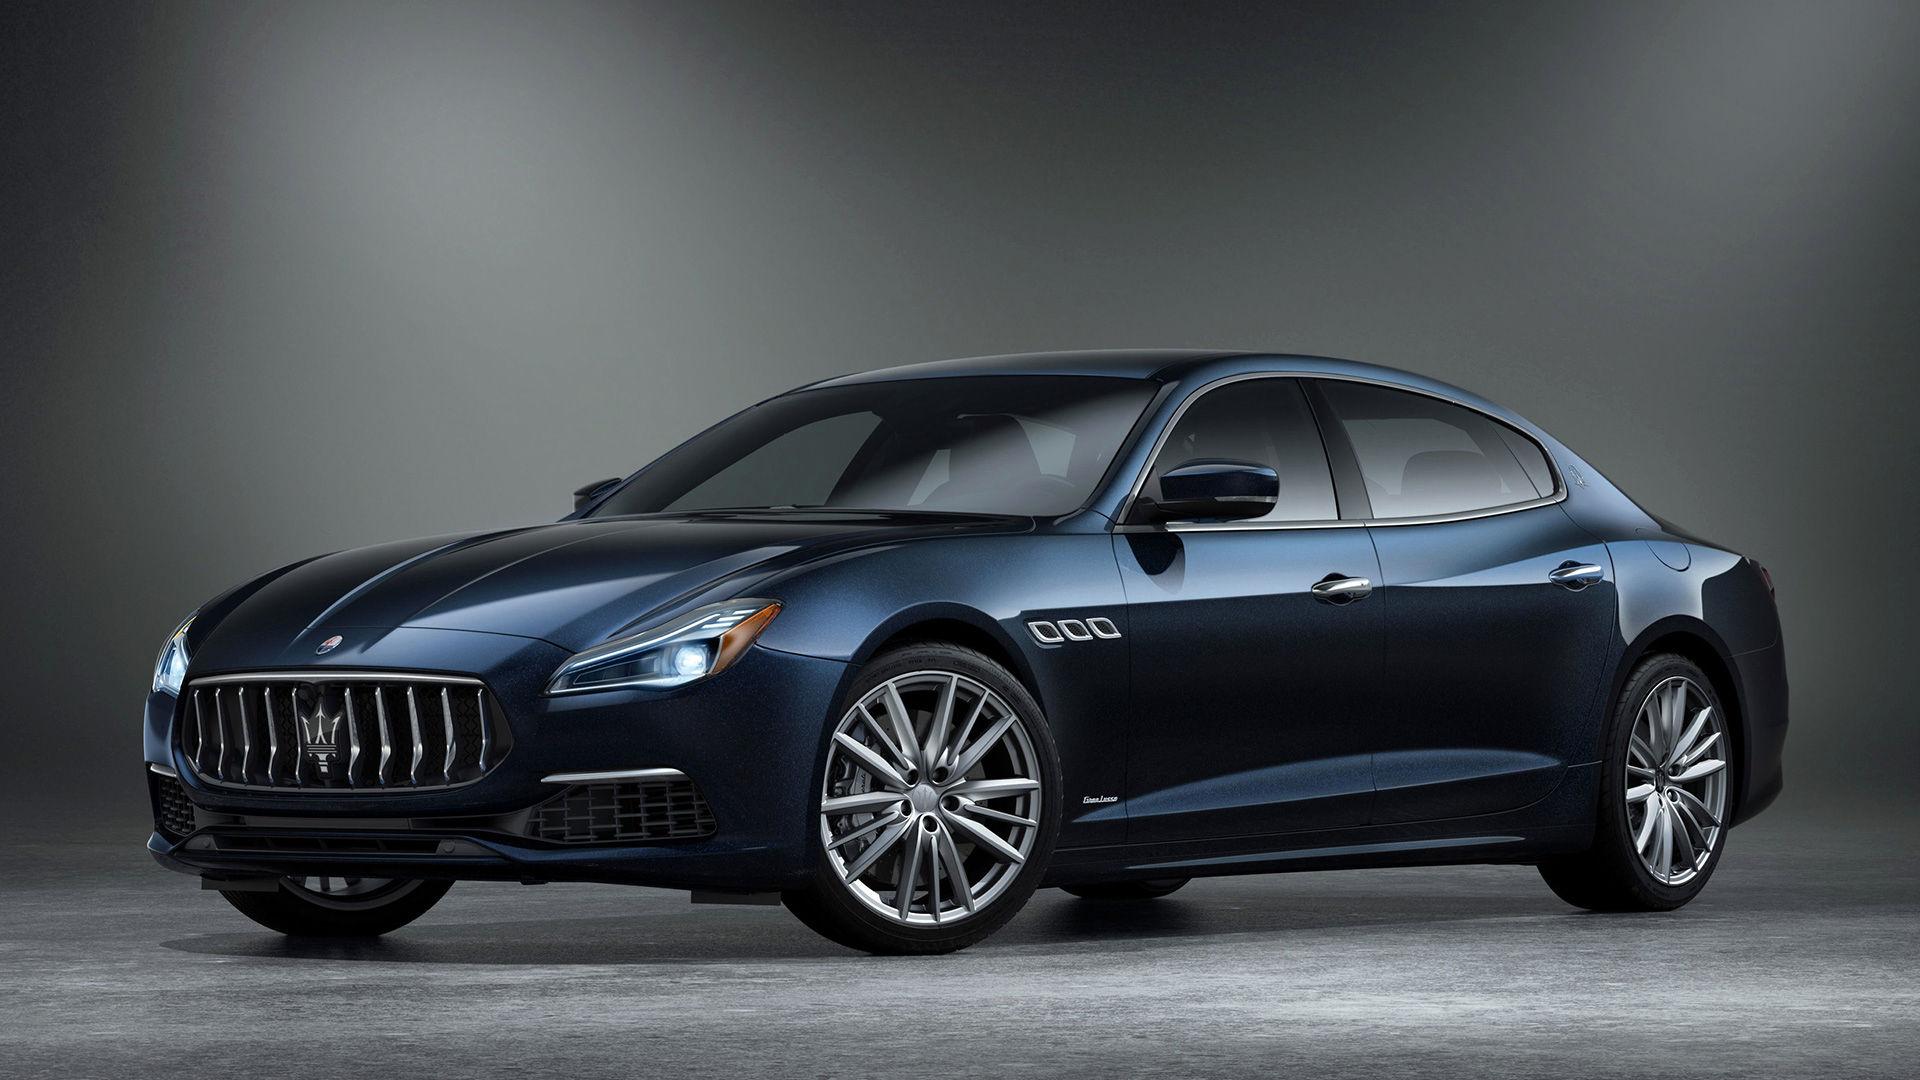 Maserati Quattroporte Edizione Nobile - vue latérale - couleur Bleu Nobile (bleu roi)